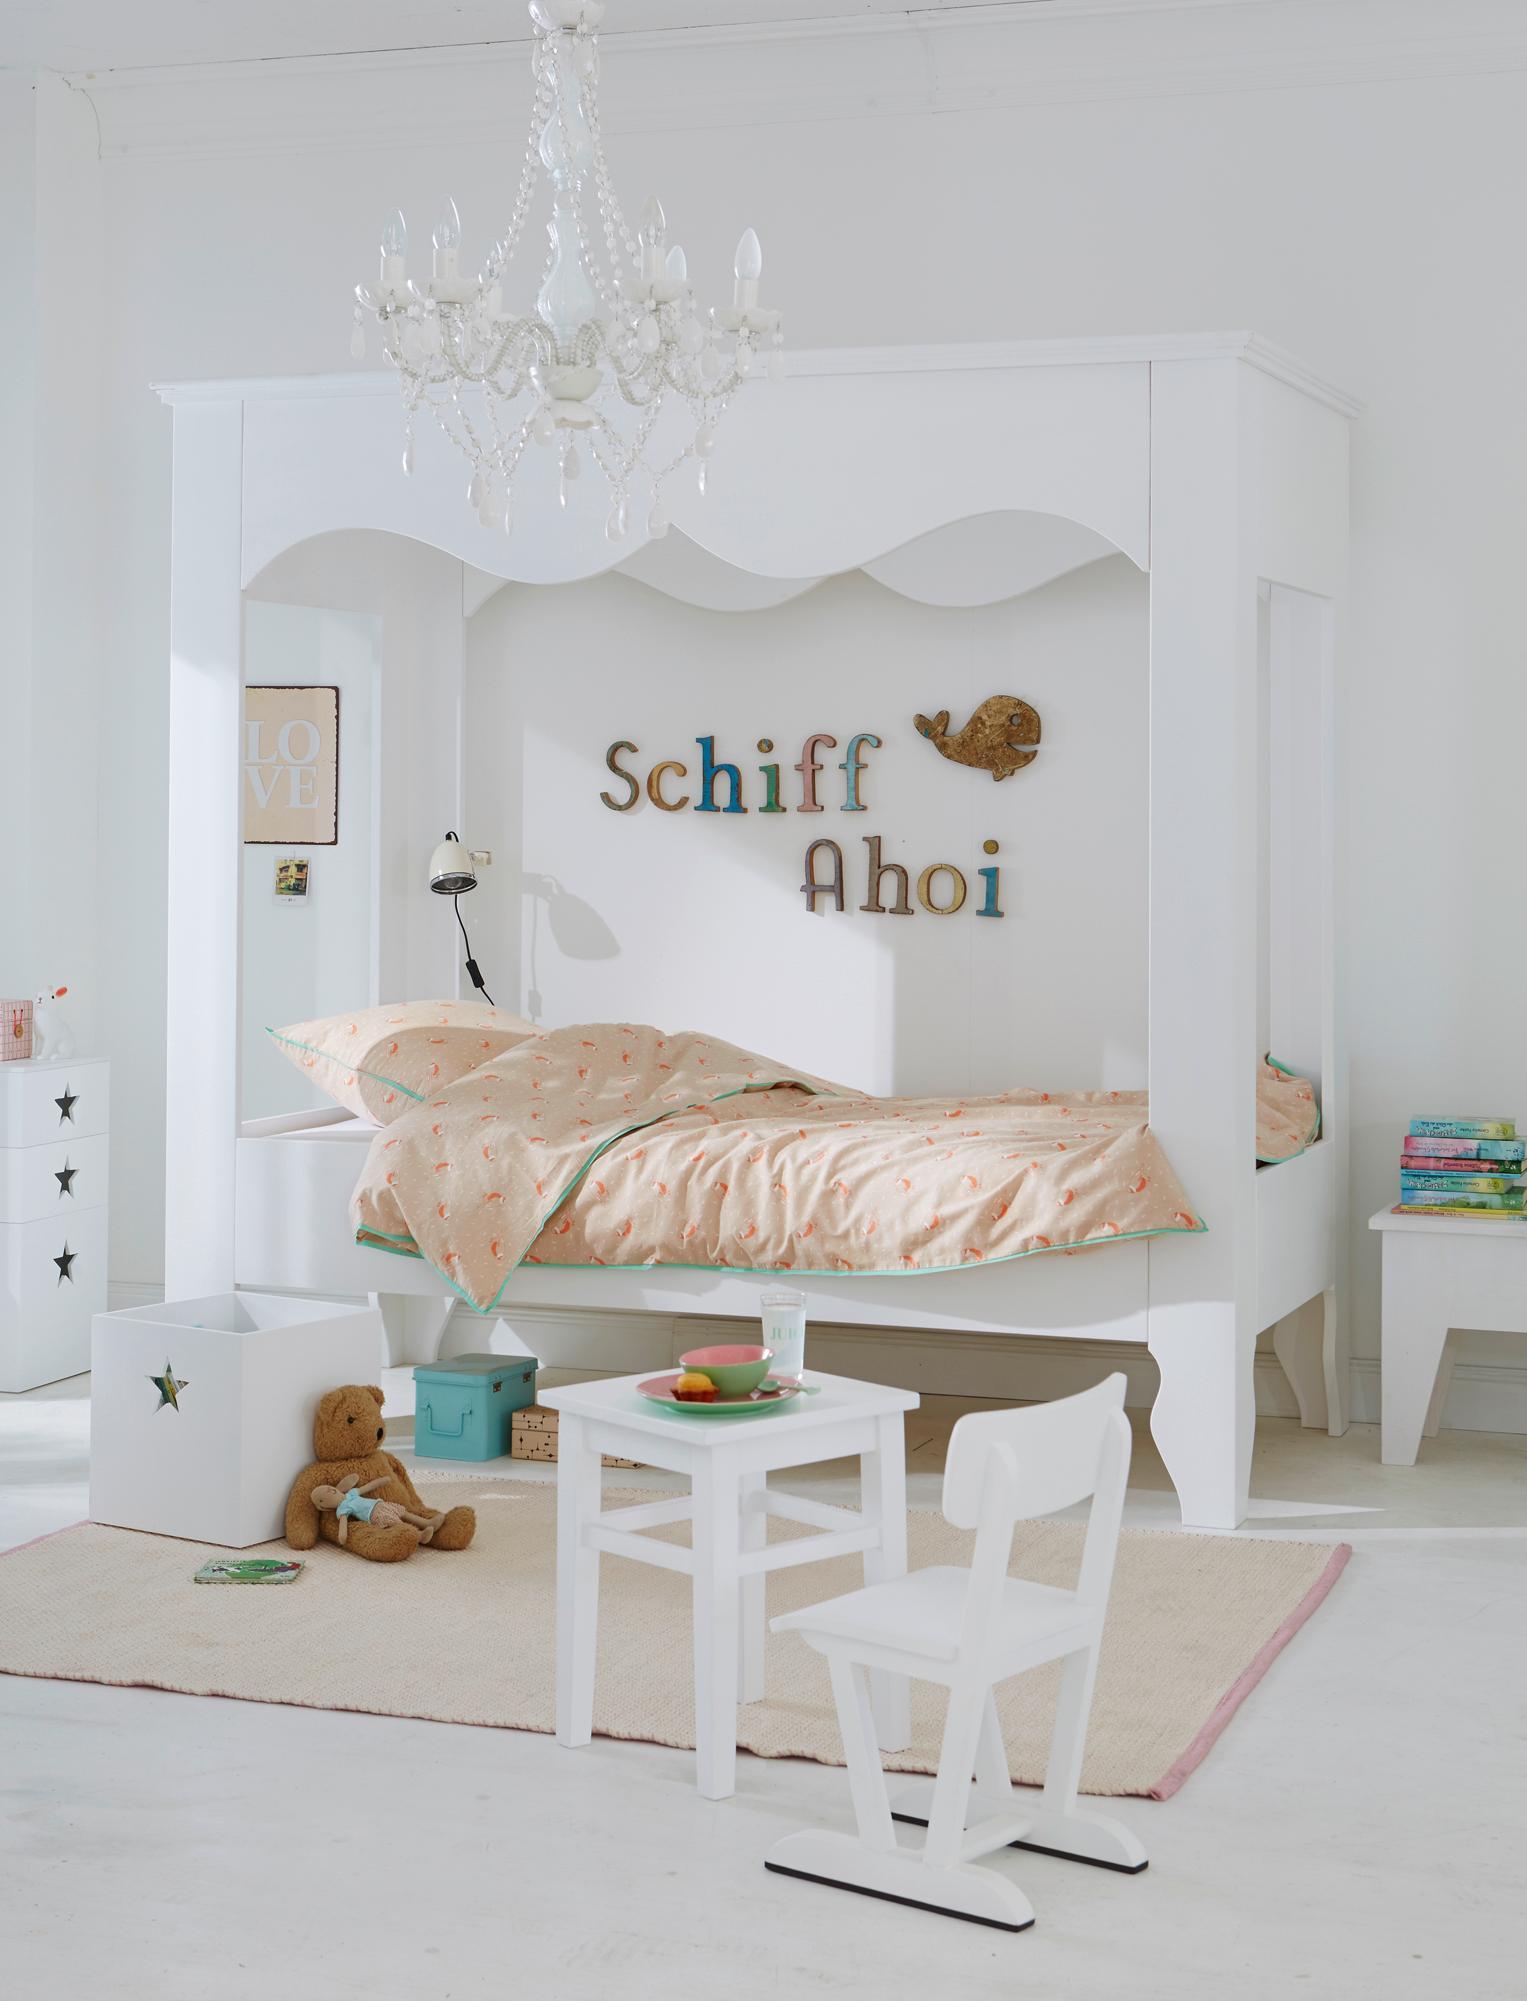 Full Size of Kronleuchter Kinderzimmer Weies Weieshimmelbett Regal Weiß Schlafzimmer Sofa Regale Kinderzimmer Kronleuchter Kinderzimmer